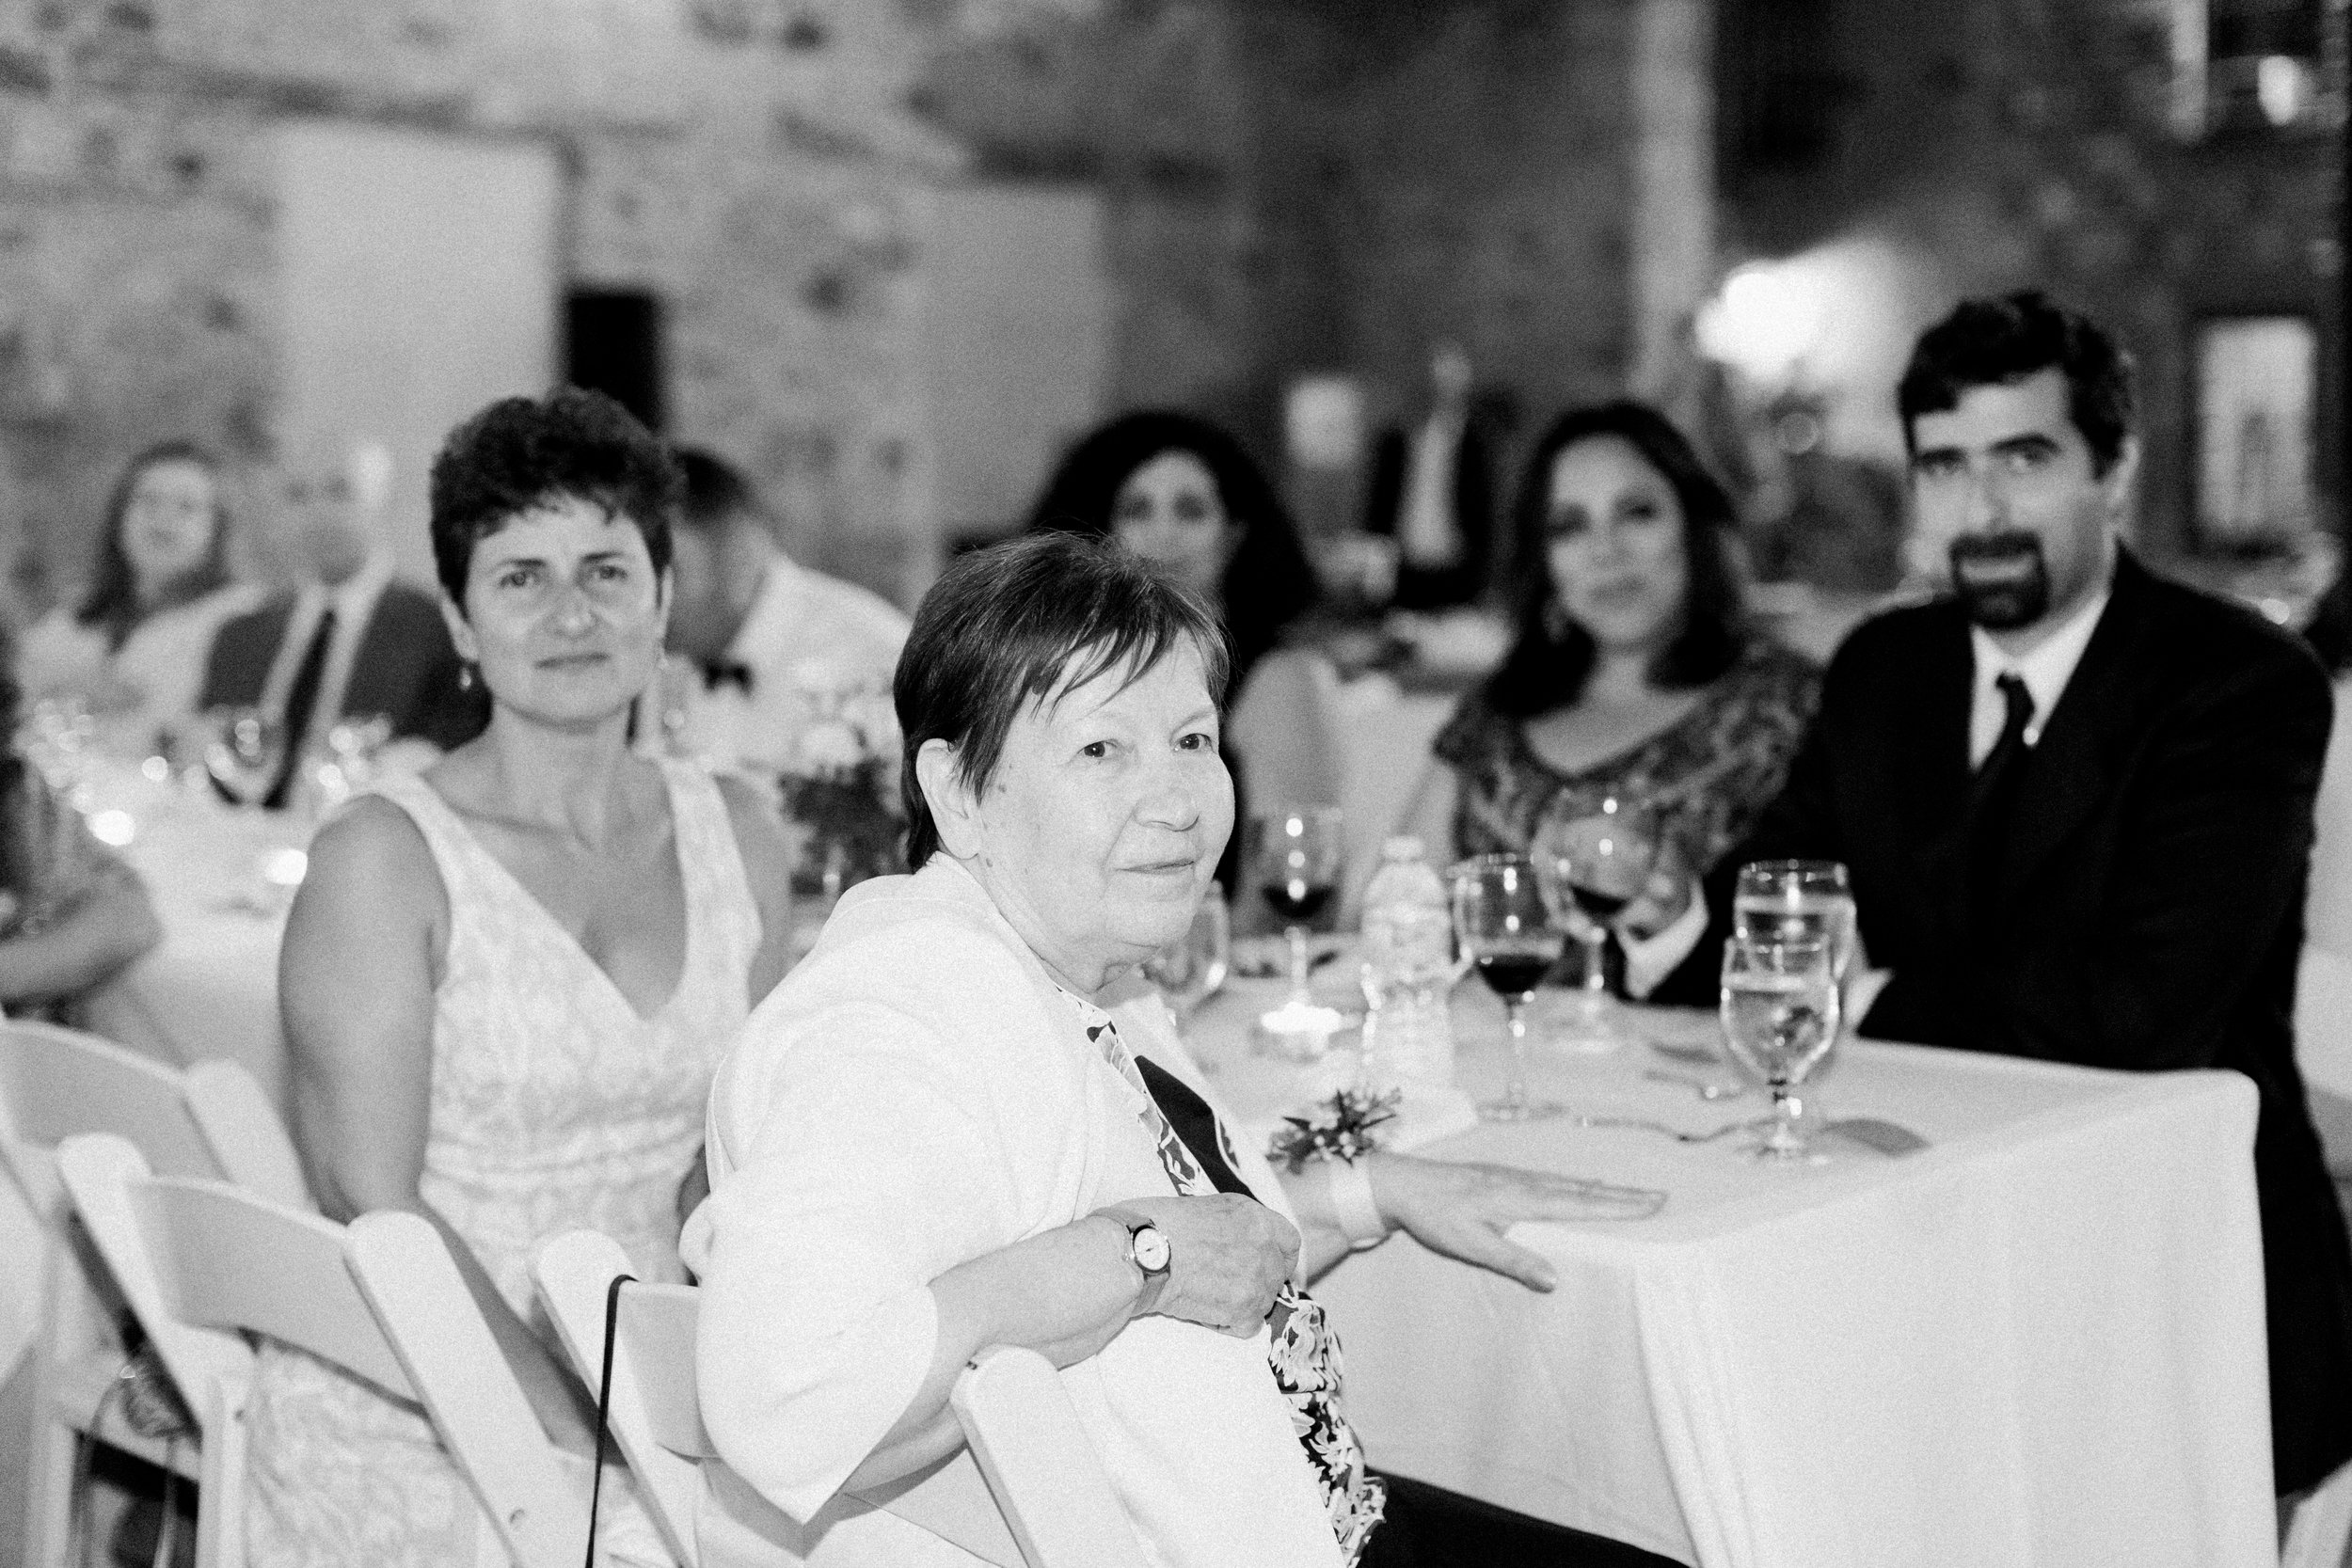 Alton Mills Wedding - Reception-117.jpg